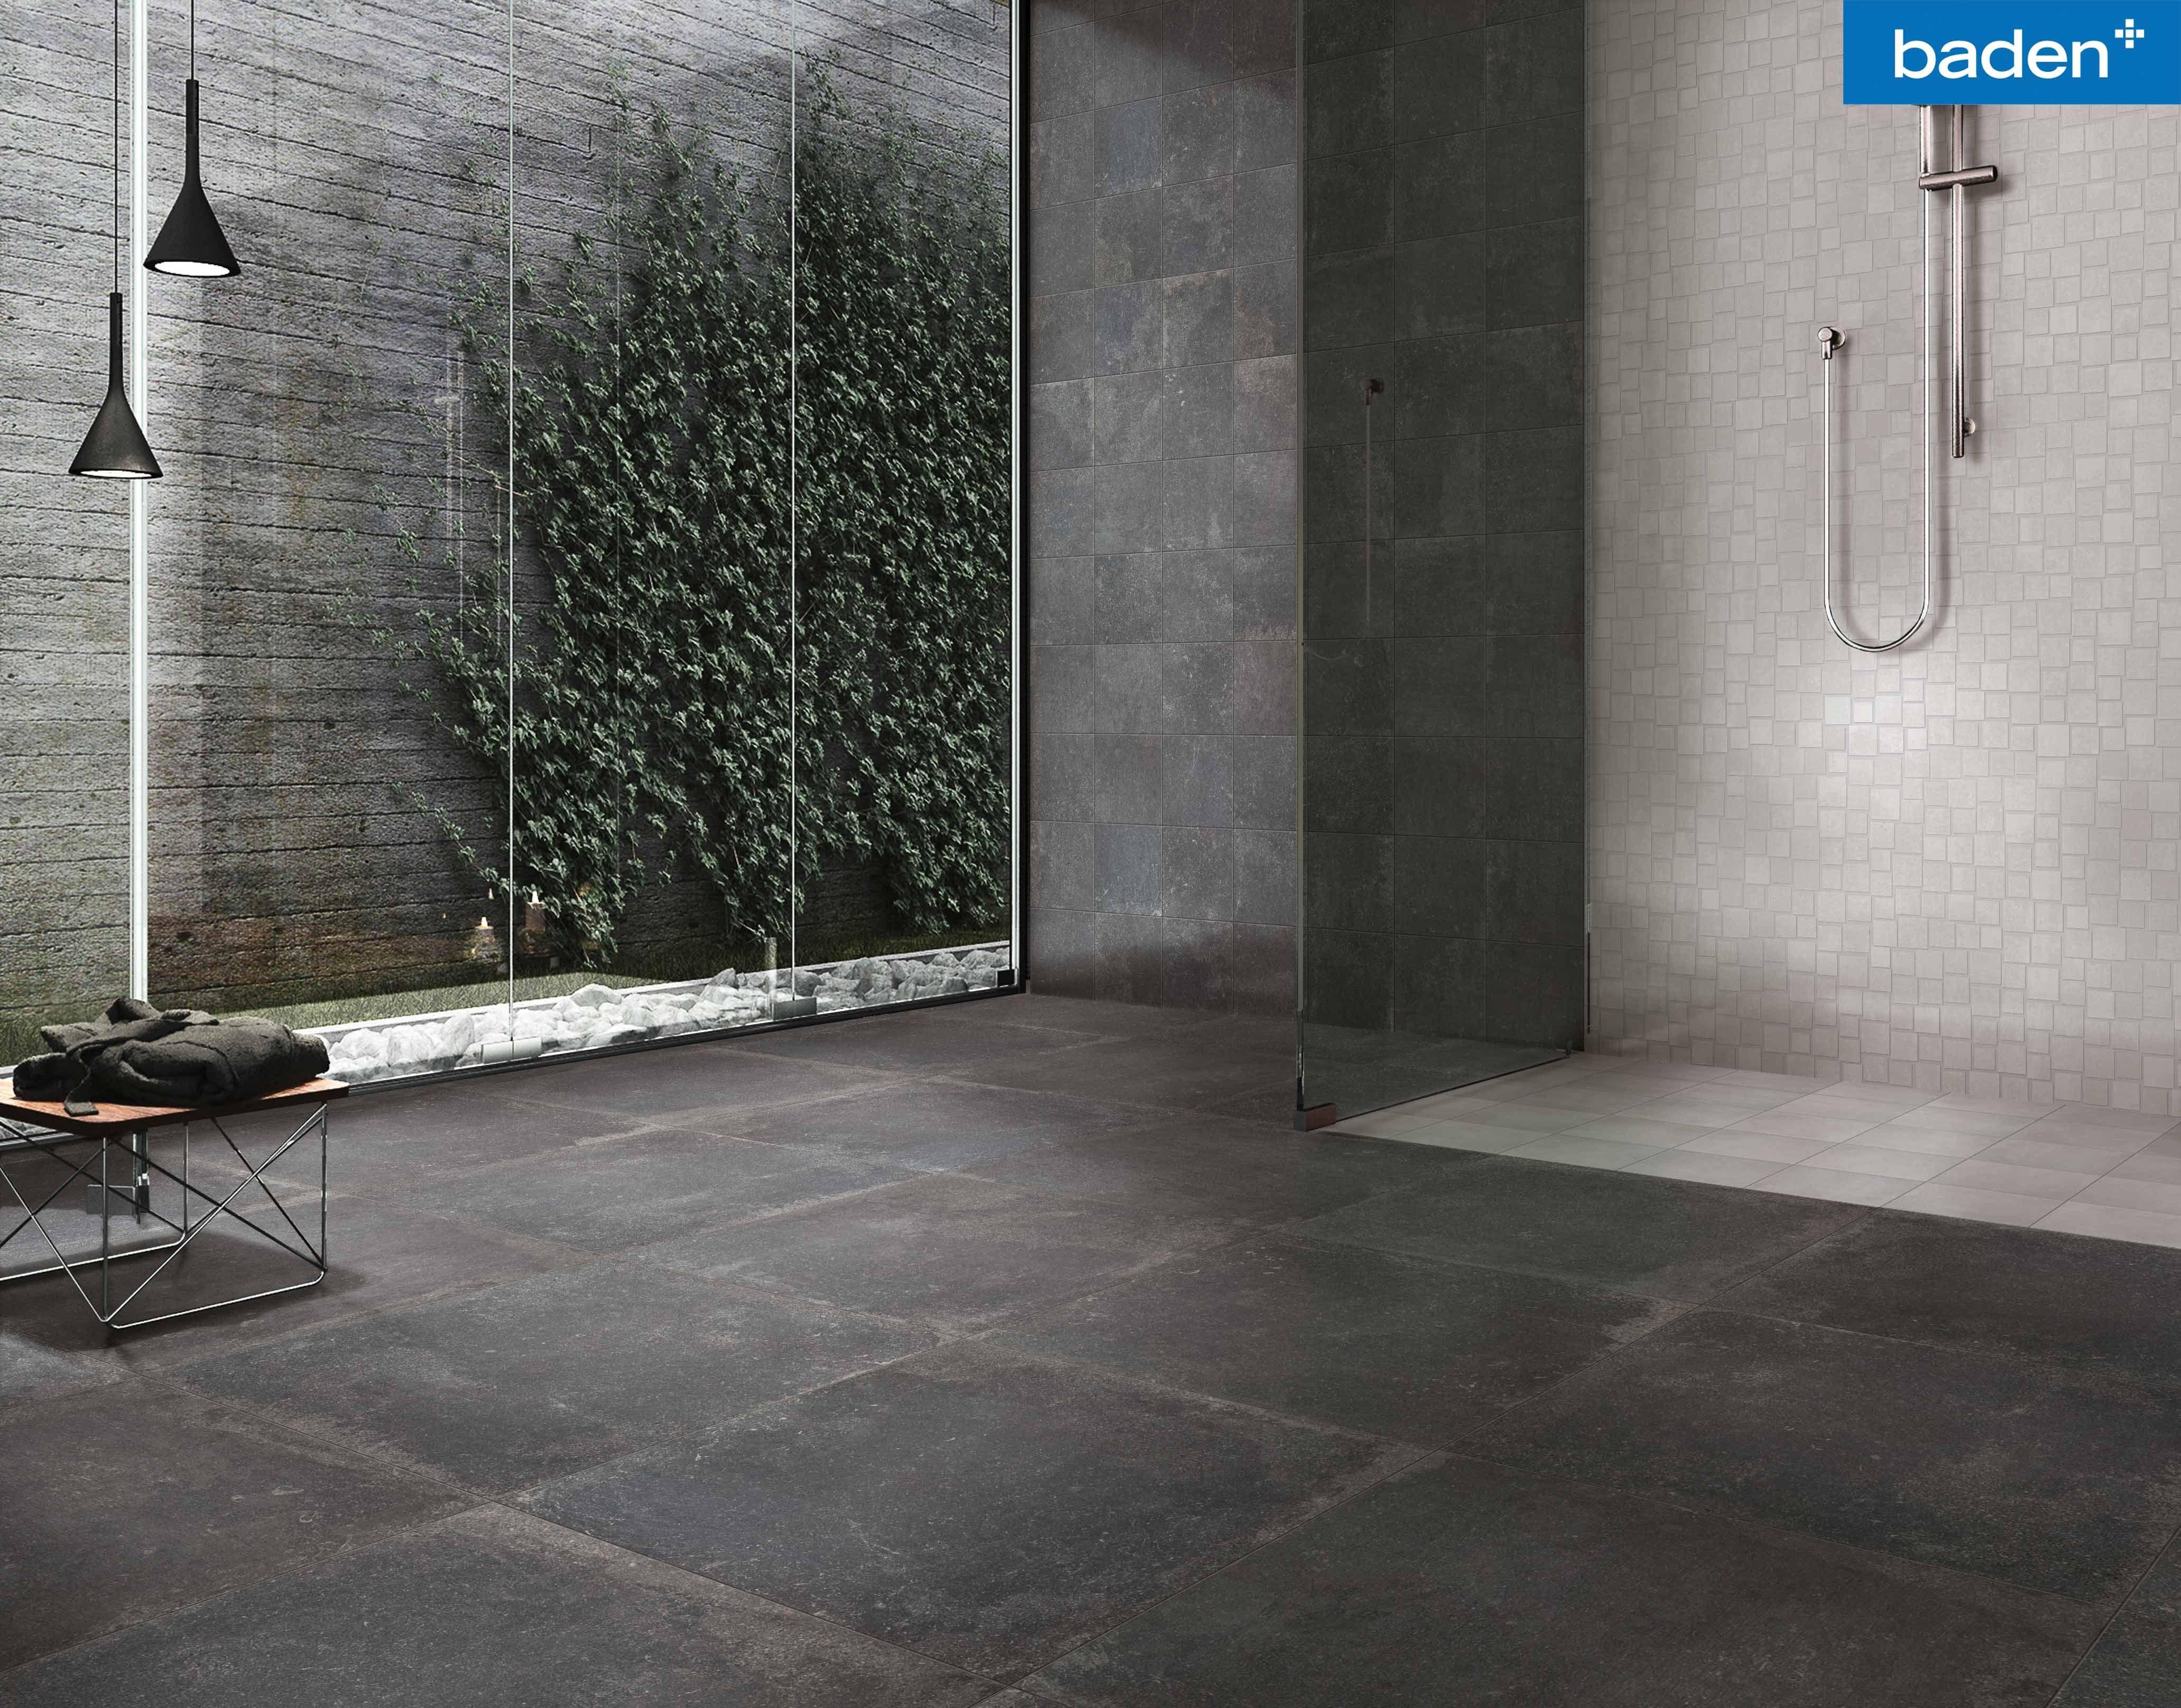 Alternatieve Wandbekleding Badkamer : Alternatief tegels badkamer houtlook tegels woonkamer en badkamer